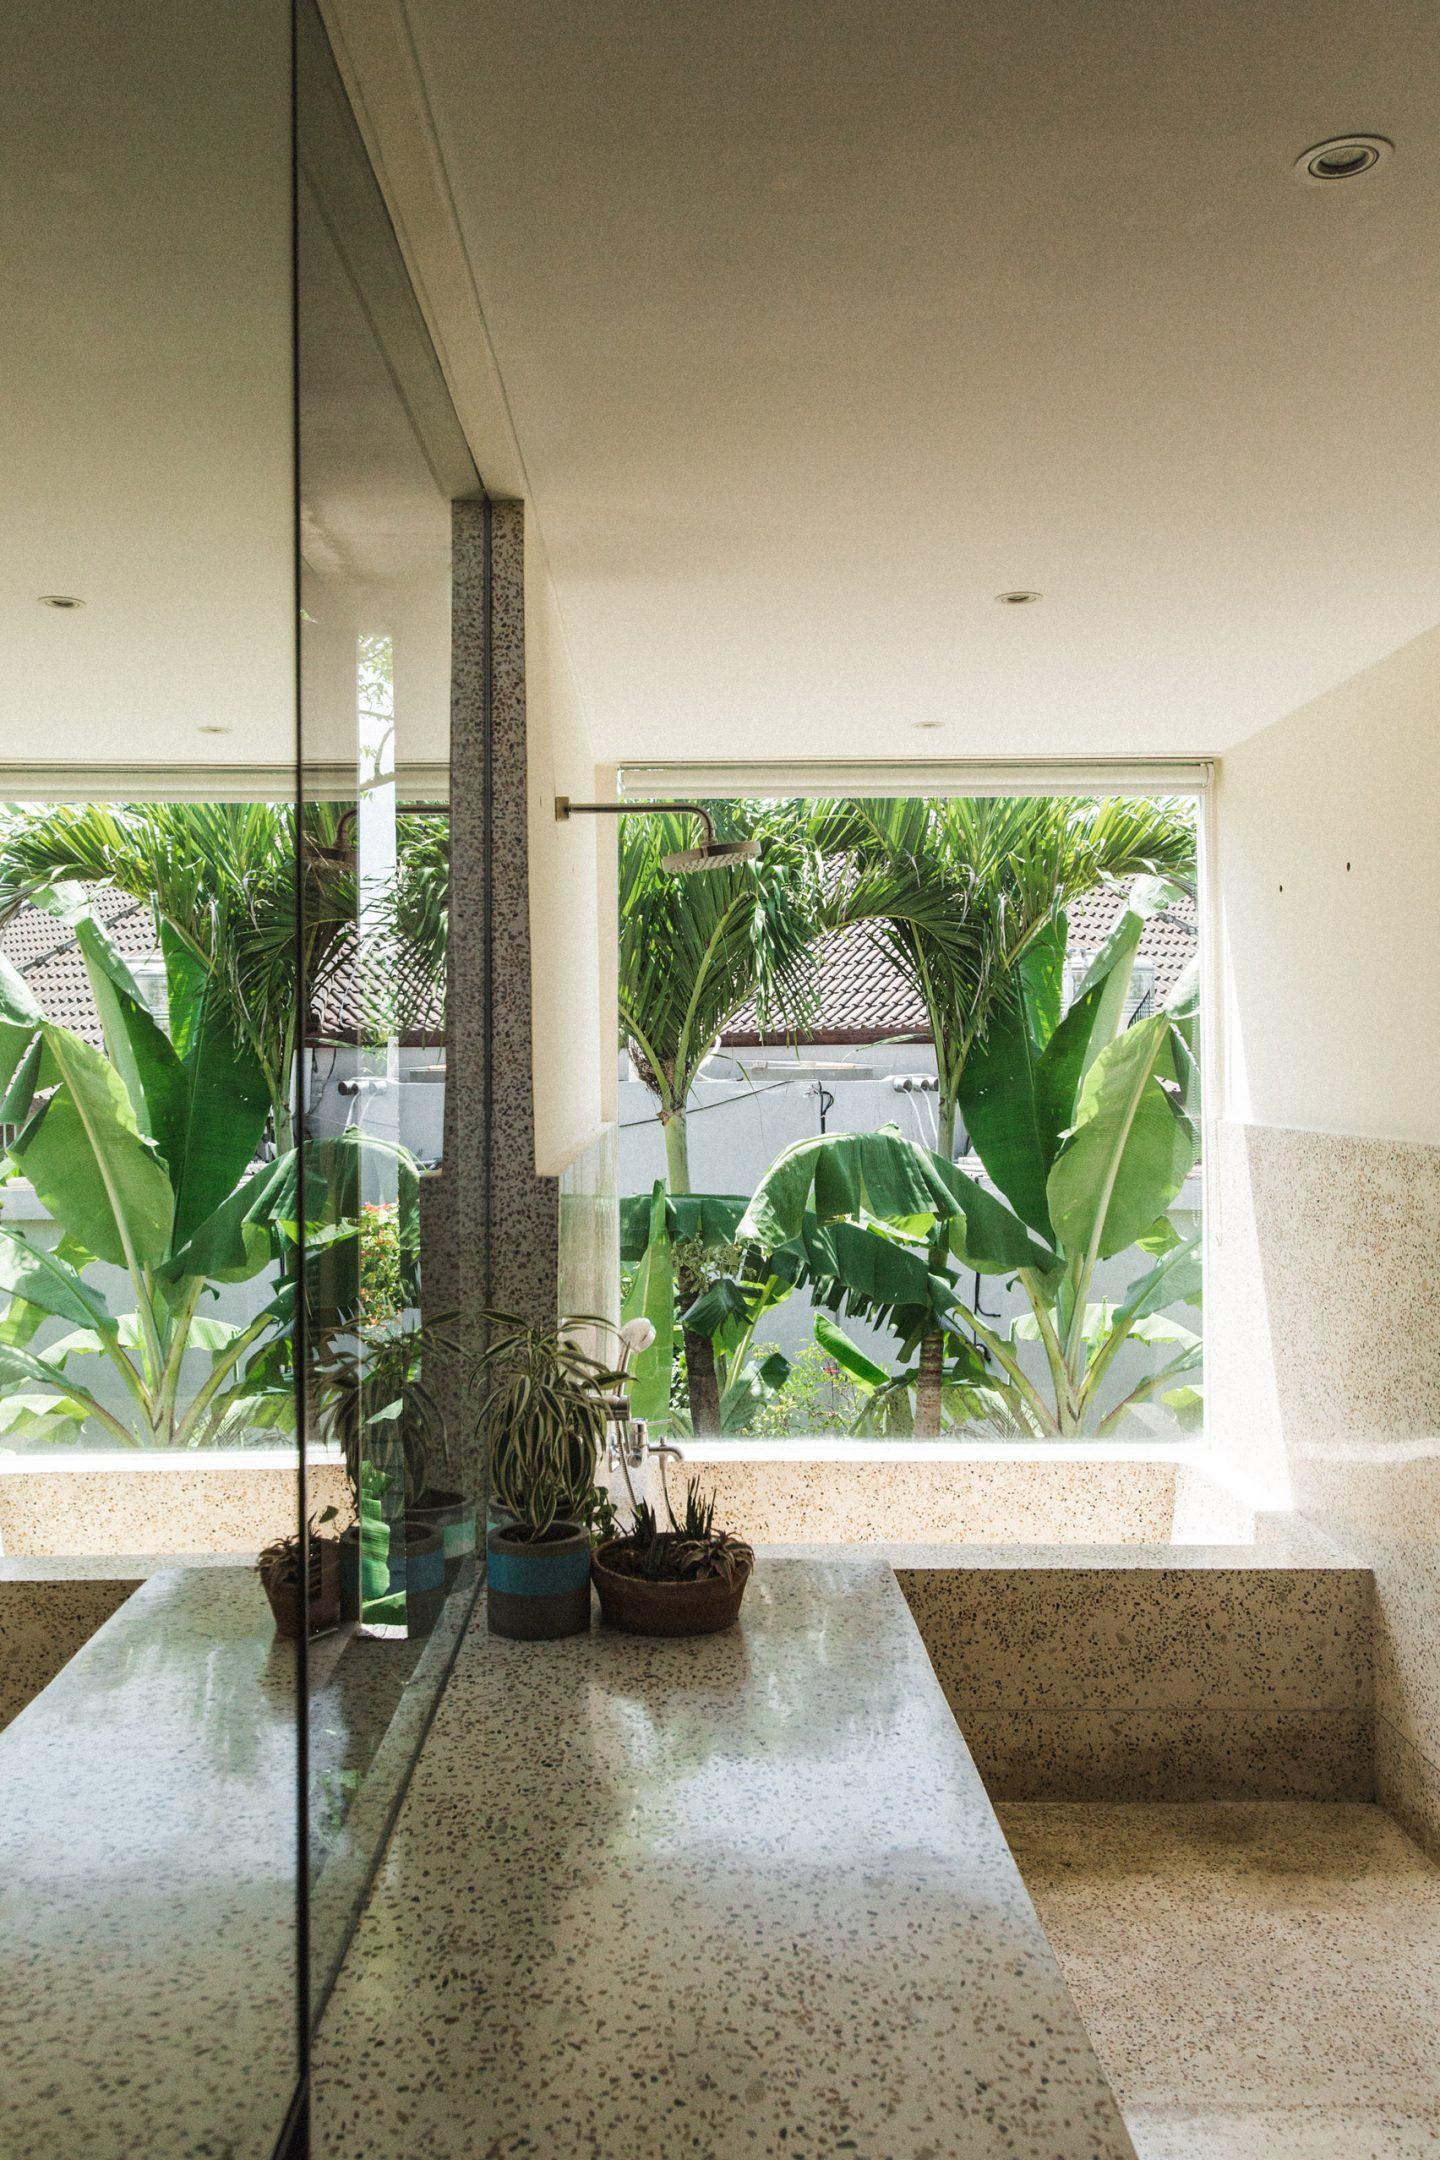 IGNANT-Architecture-Patisandhika-Daniel-Mitchell-Indonesia-Brutalist-Home-3